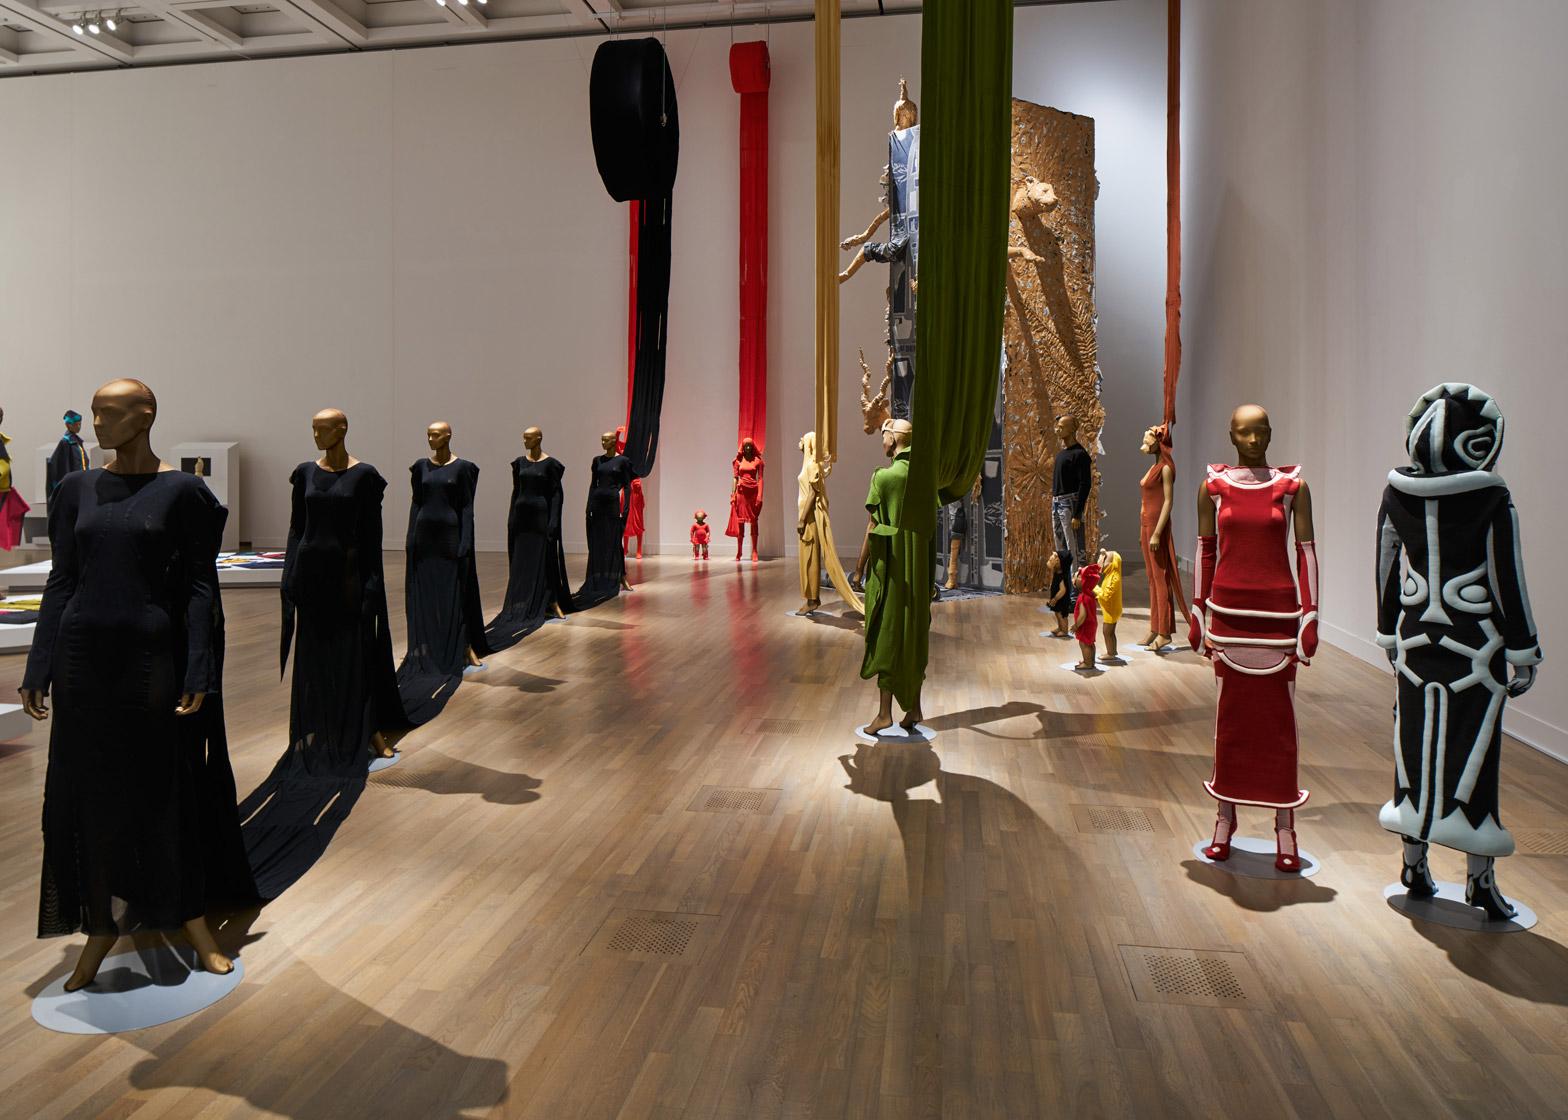 the-work-of-miyake-issey-exhibition-the-national-art-centre-tokyo_dezeen_1568_10.jpg